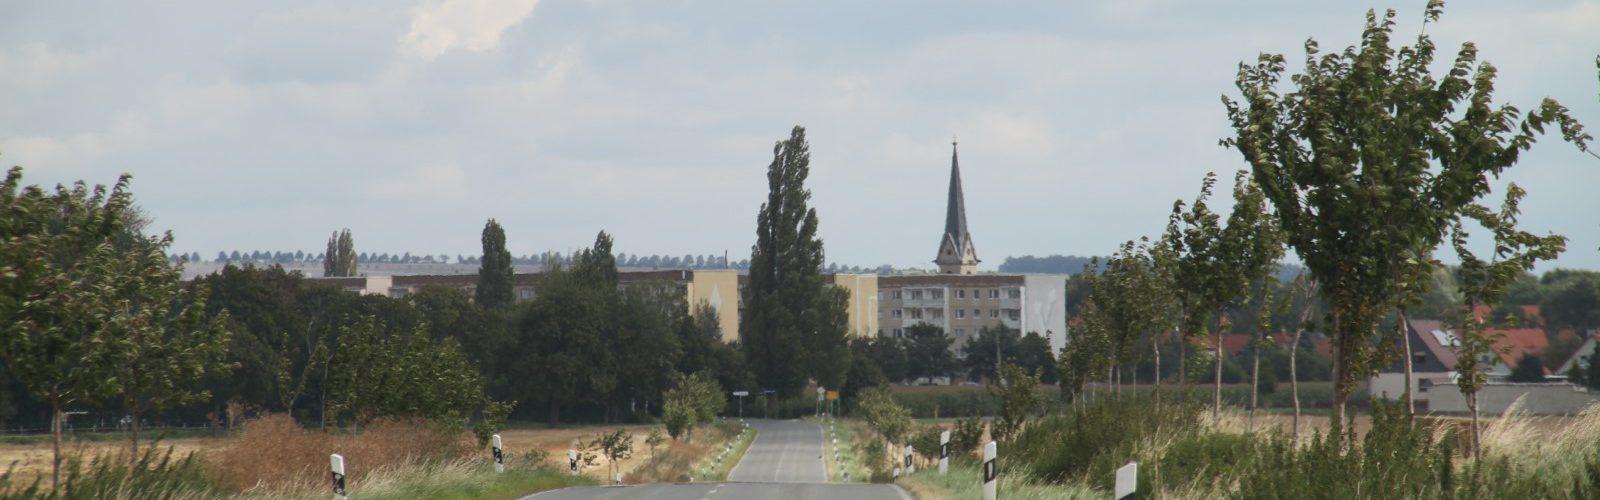 Ortseingang aus Richtung Quedlinburg